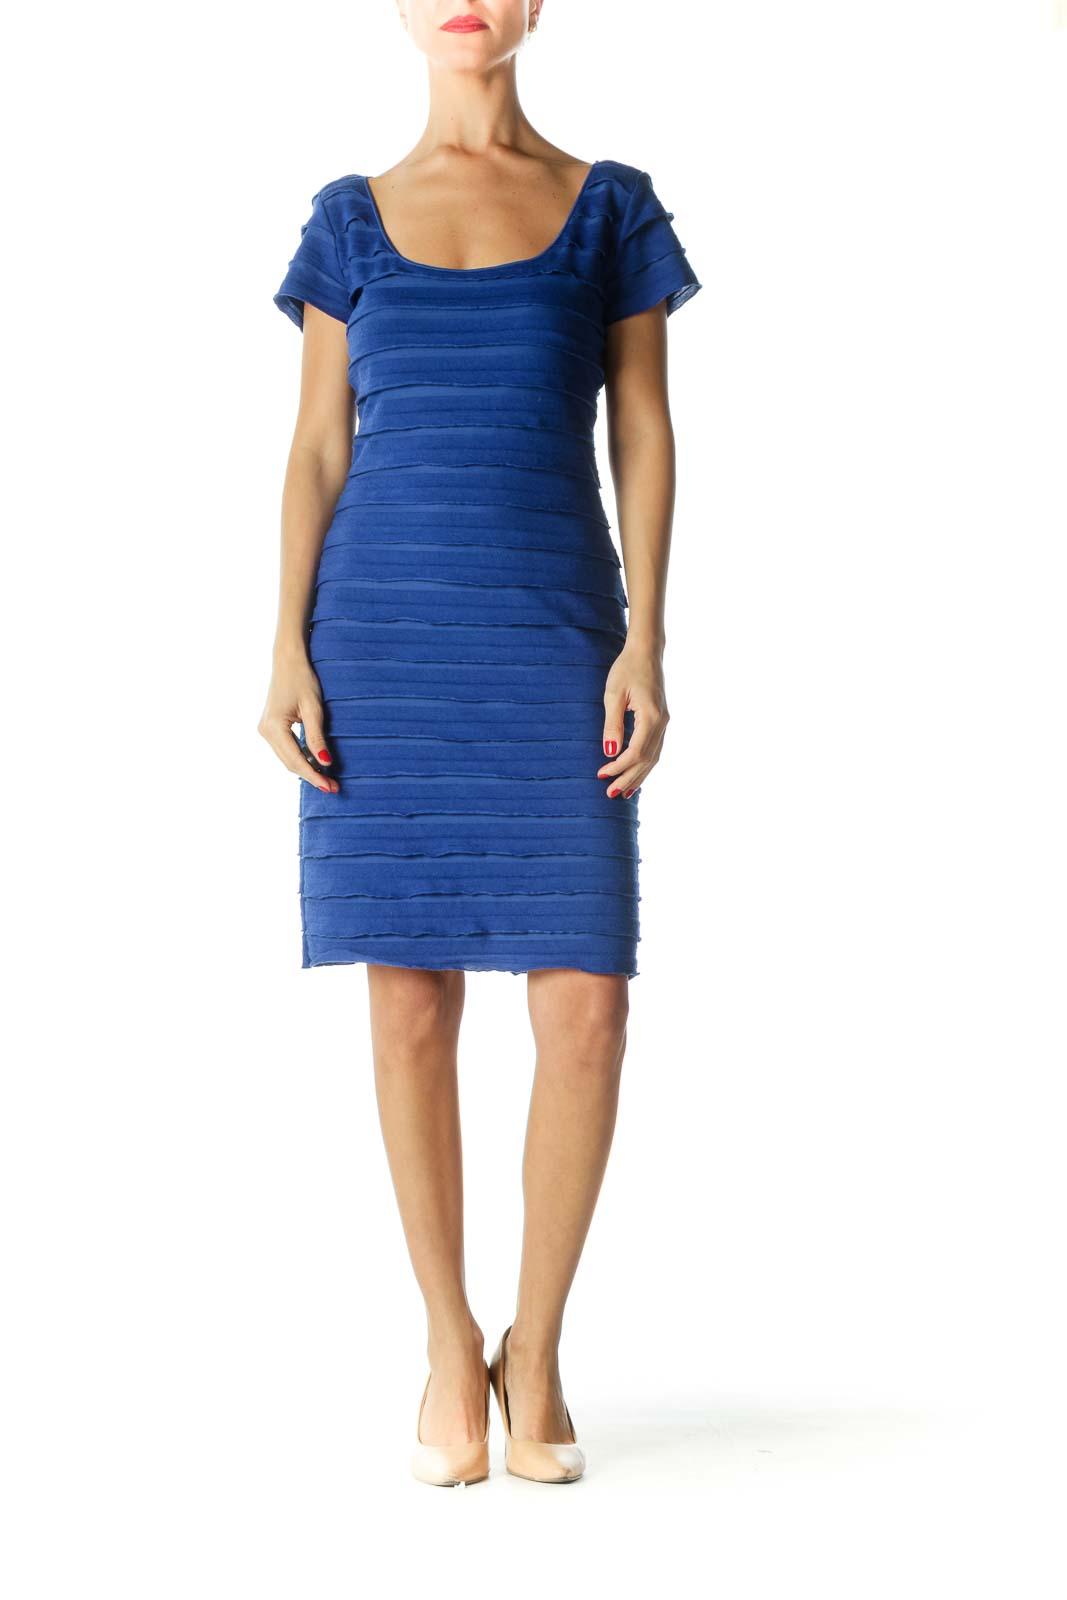 Blue Ruffled Round Neck Work Dress